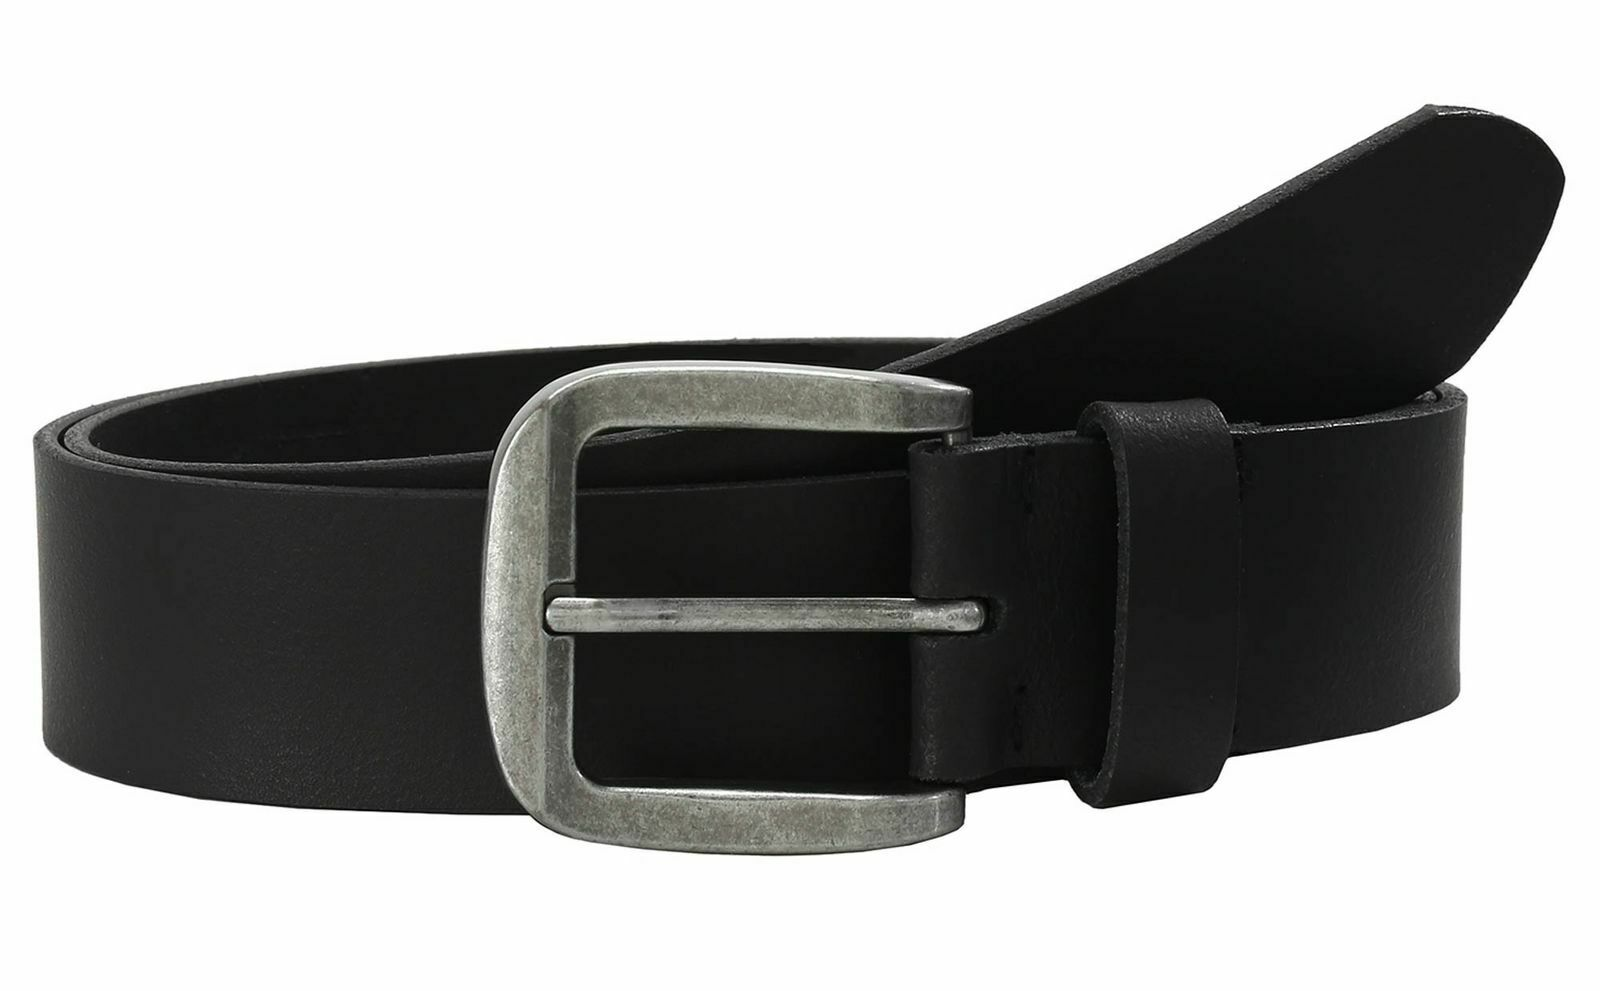 LLOYD Fashion Leather Belt 4.0 W120 Gürtel Accessoire Black Schwarz